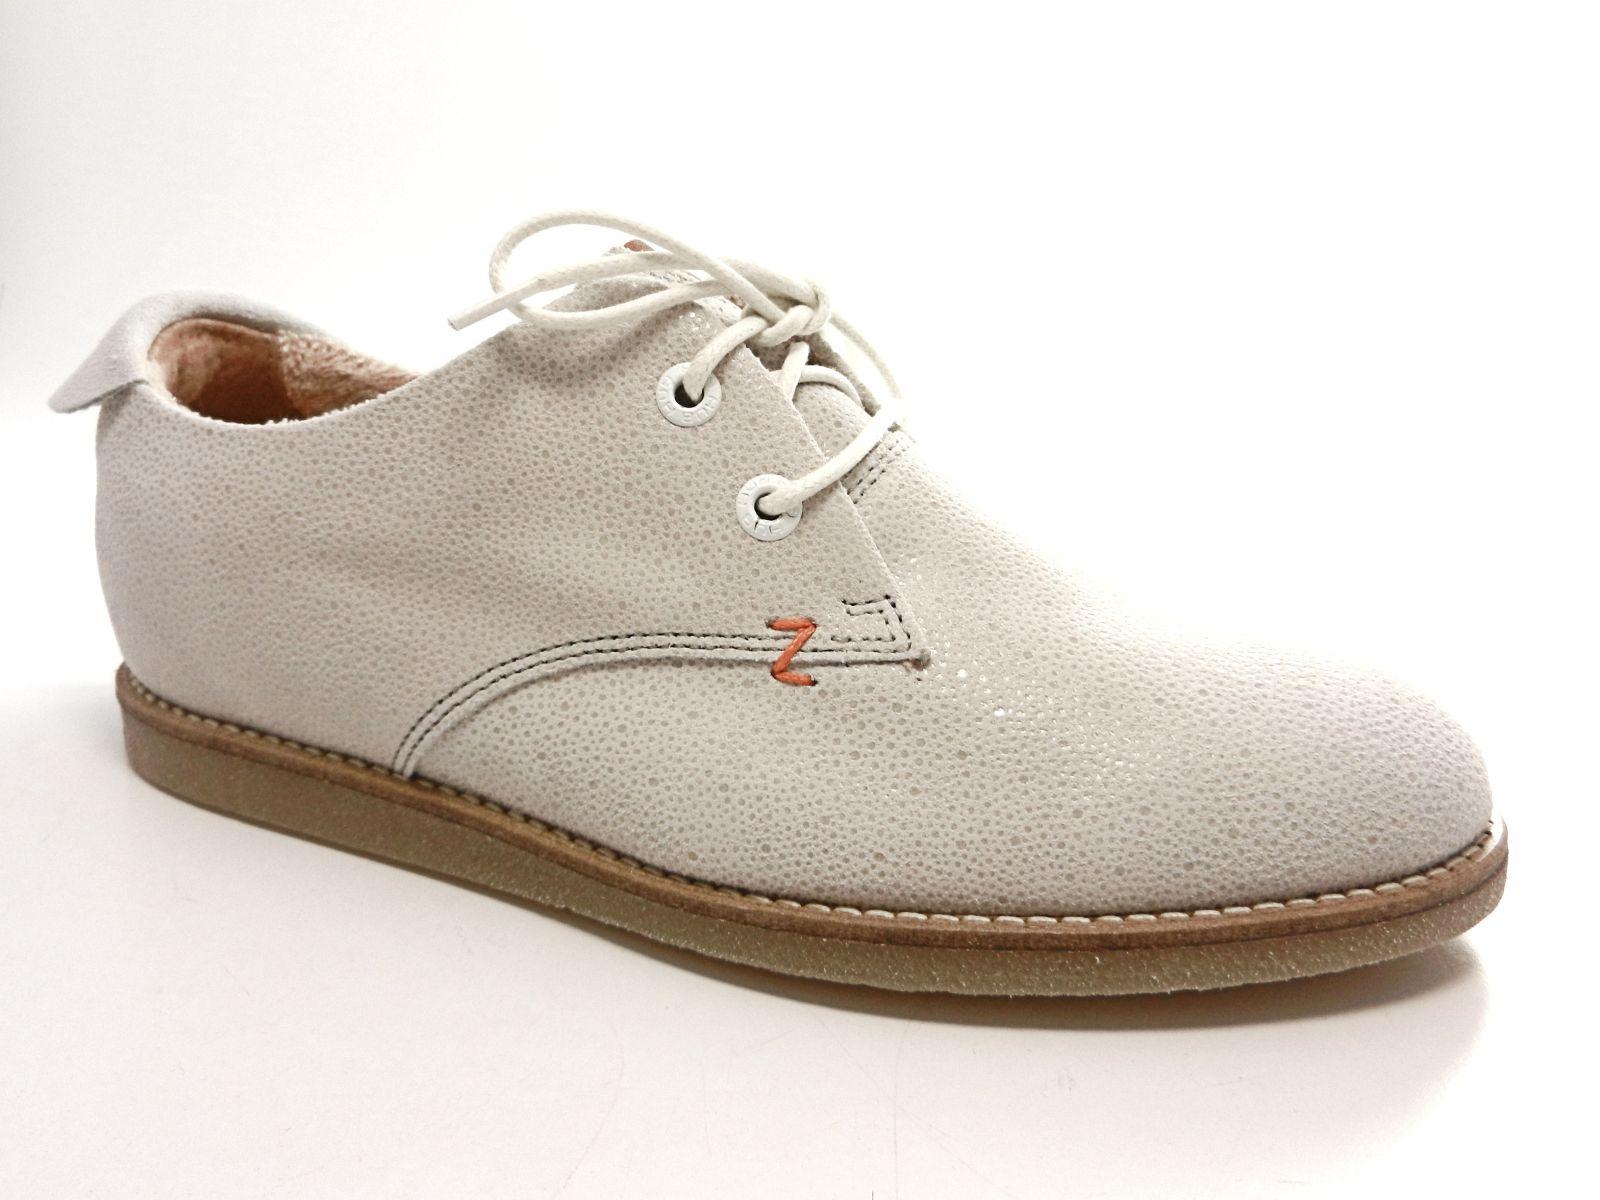 Chaussures Moyeu Rose uLVEWMdA9